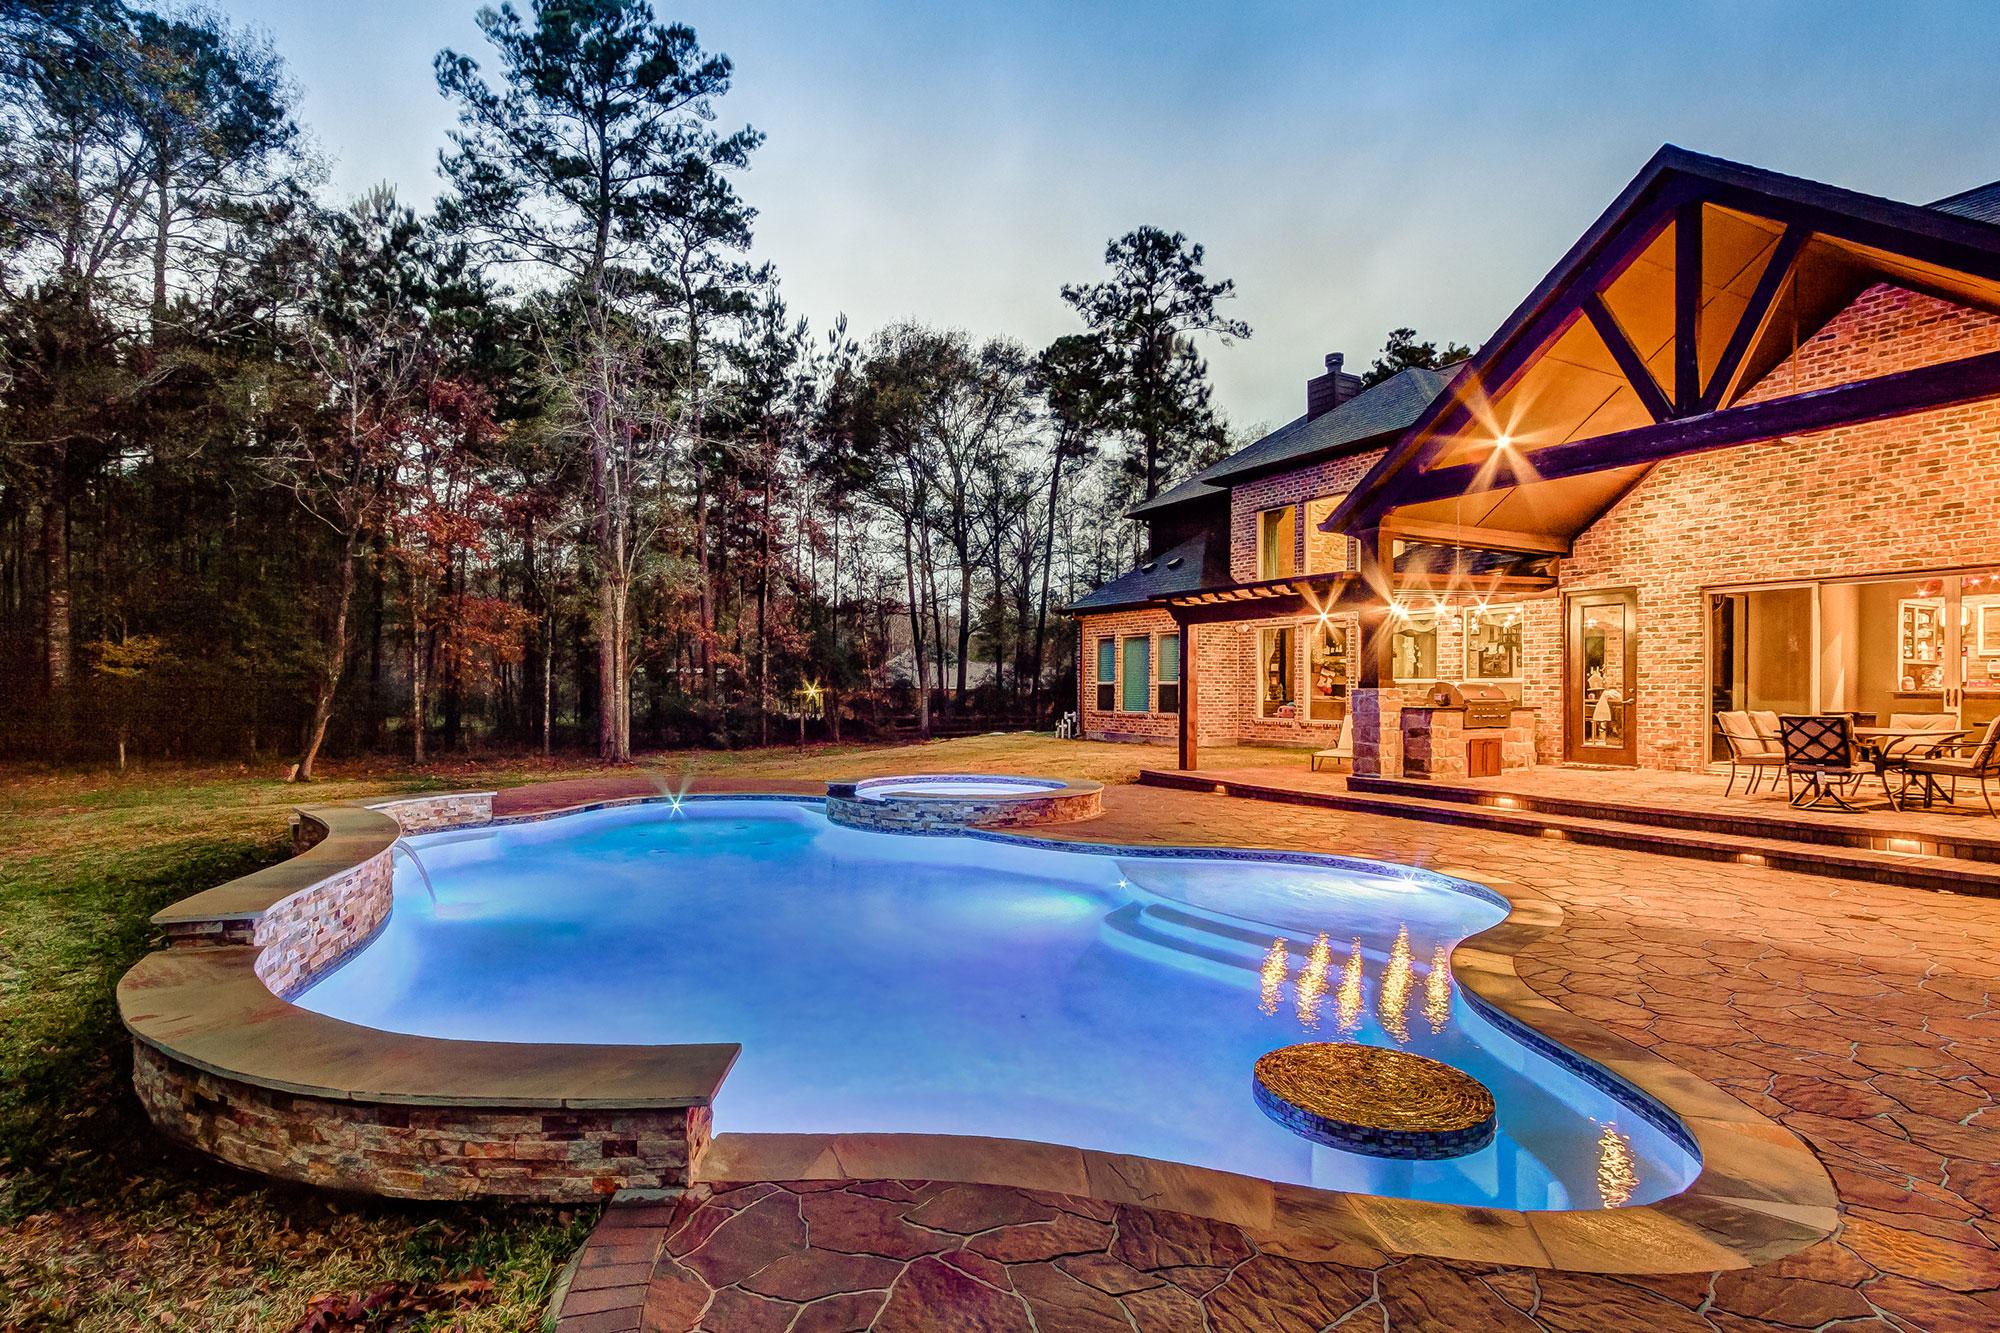 Pool Landscaping Design, creekstone outdoor living, houston, tx